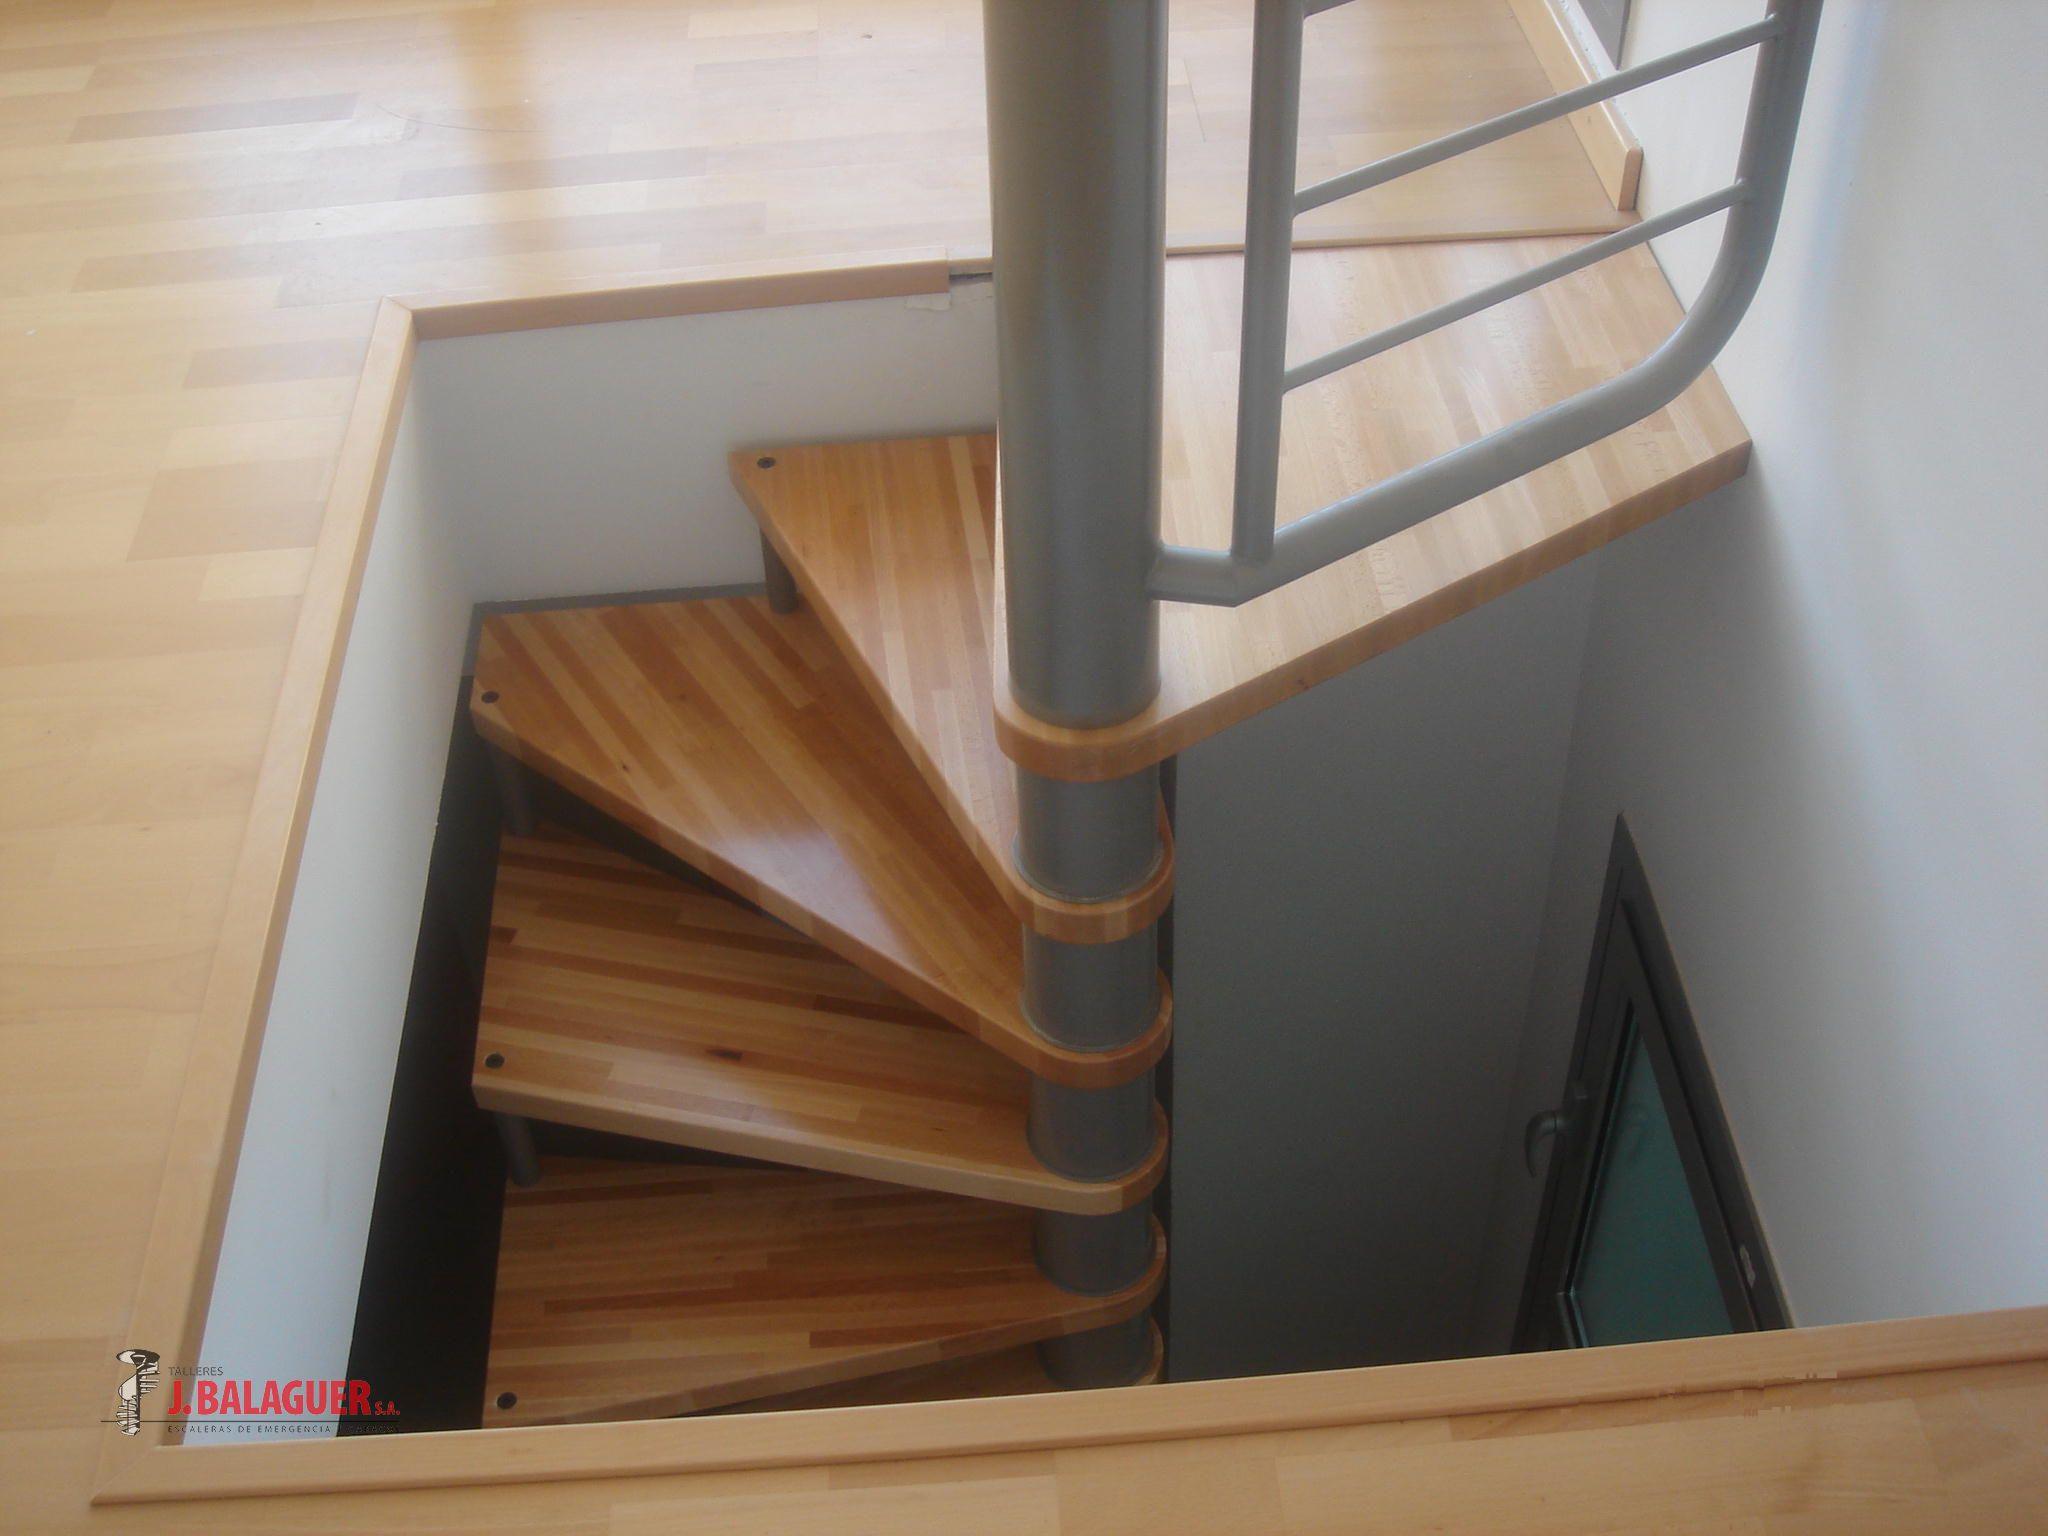 Colecci n del modelo m64 escaleras balaguer - Escaleras de caracol metalicas ...